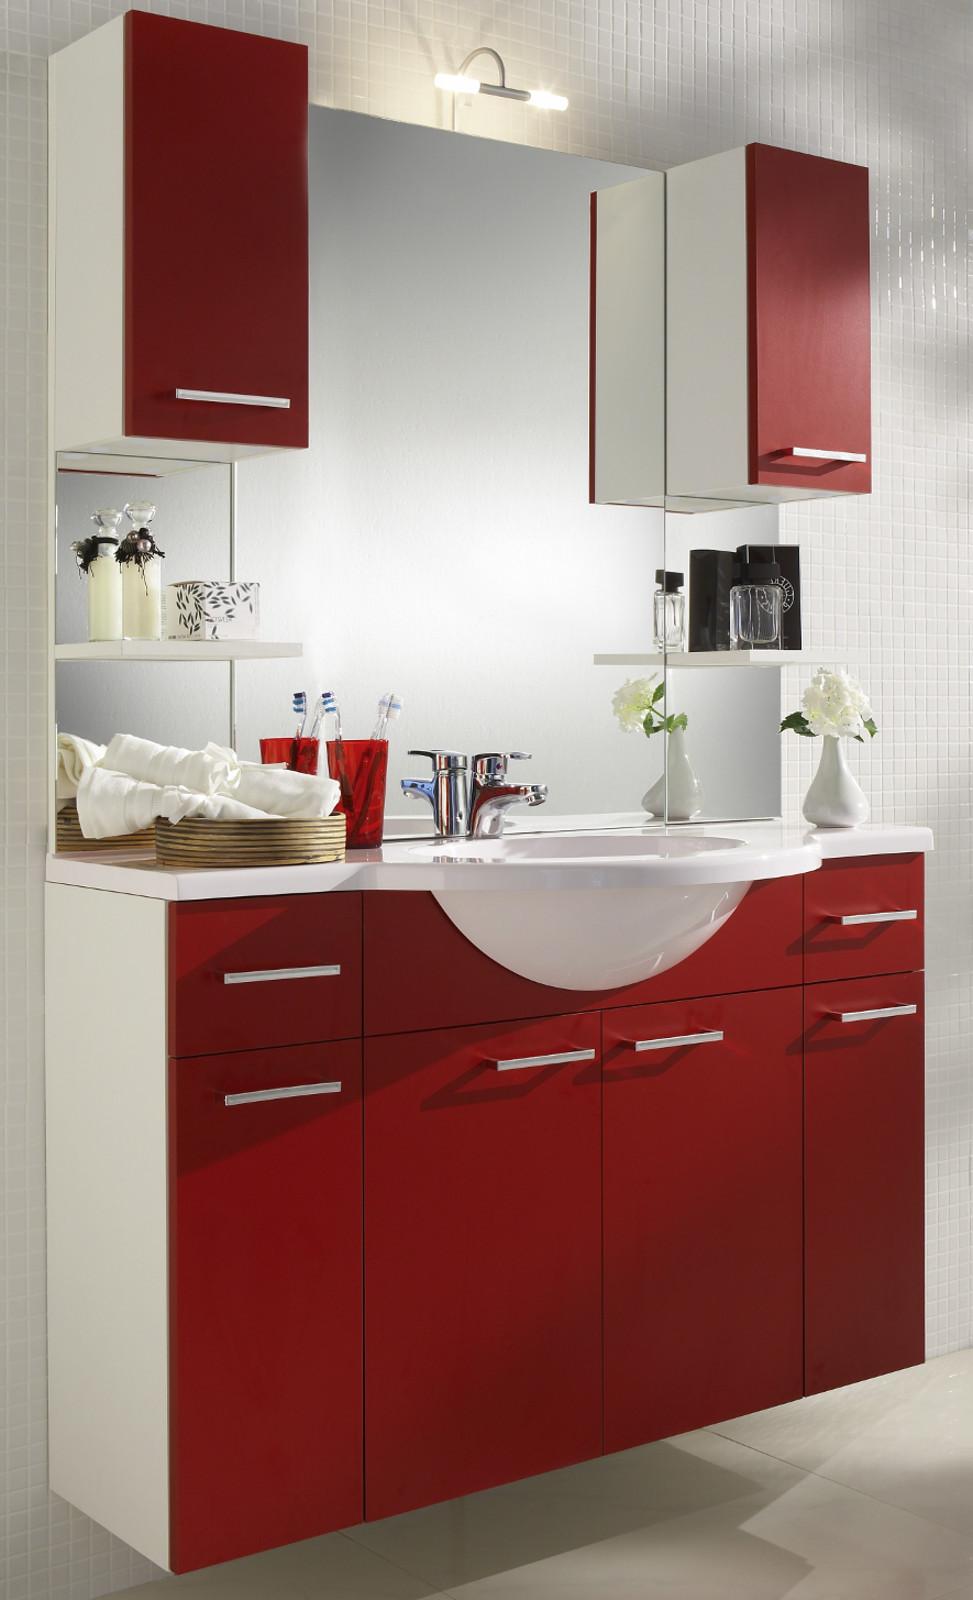 badmobel rot, waschplatz inkl. mineralgussbecken in rot weiß, Design ideen